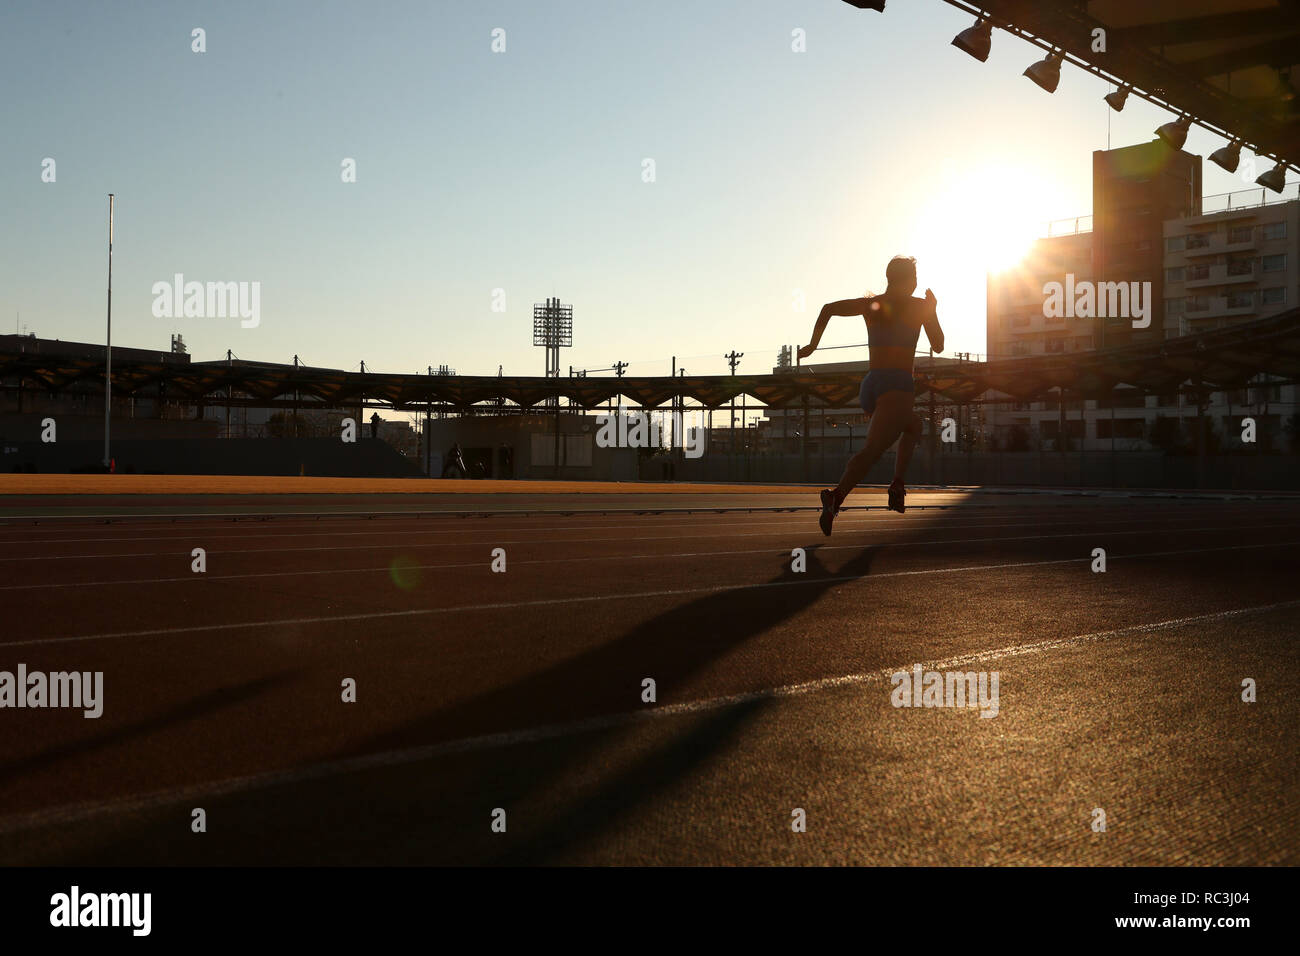 Tokyo, Japan. 13th Jan, 2019. The ambience shot Athletics : JAAF women's relay sprinter selection at Ajinomoto national training cener athletis field in Tokyo, Japan . Credit: Yohei Osada/AFLO SPORT/Alamy Live News - Stock Image